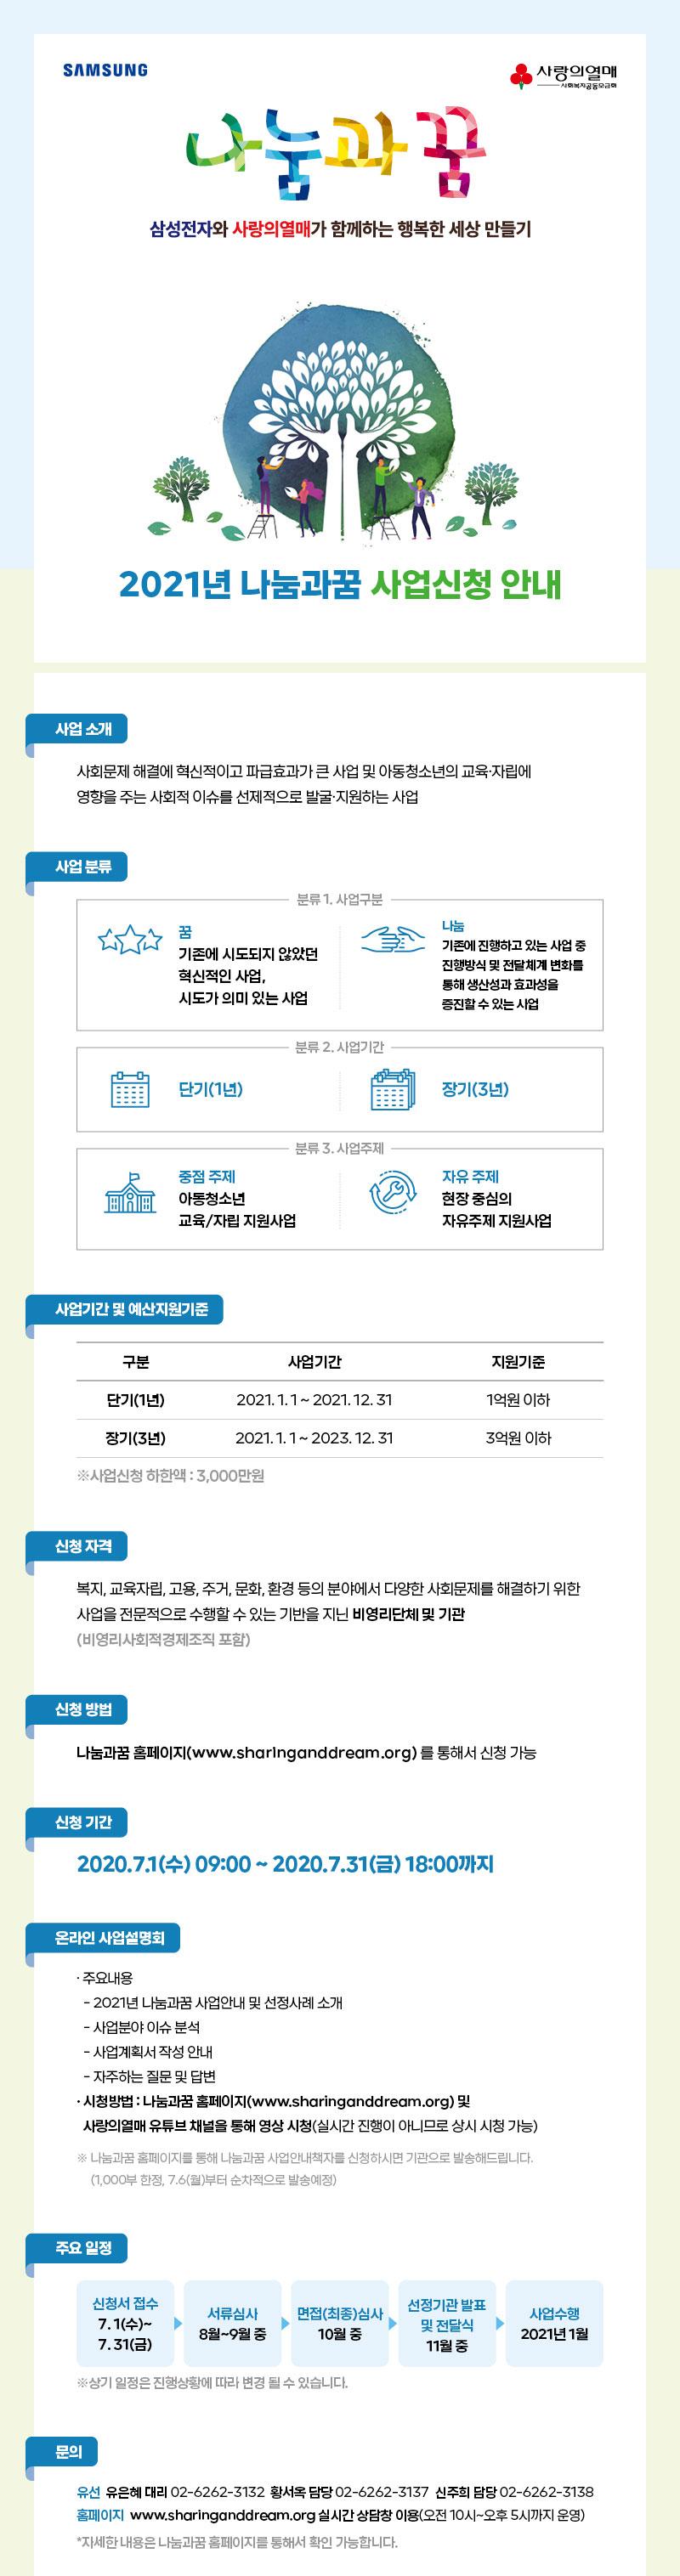 news_1_20200629.jpg